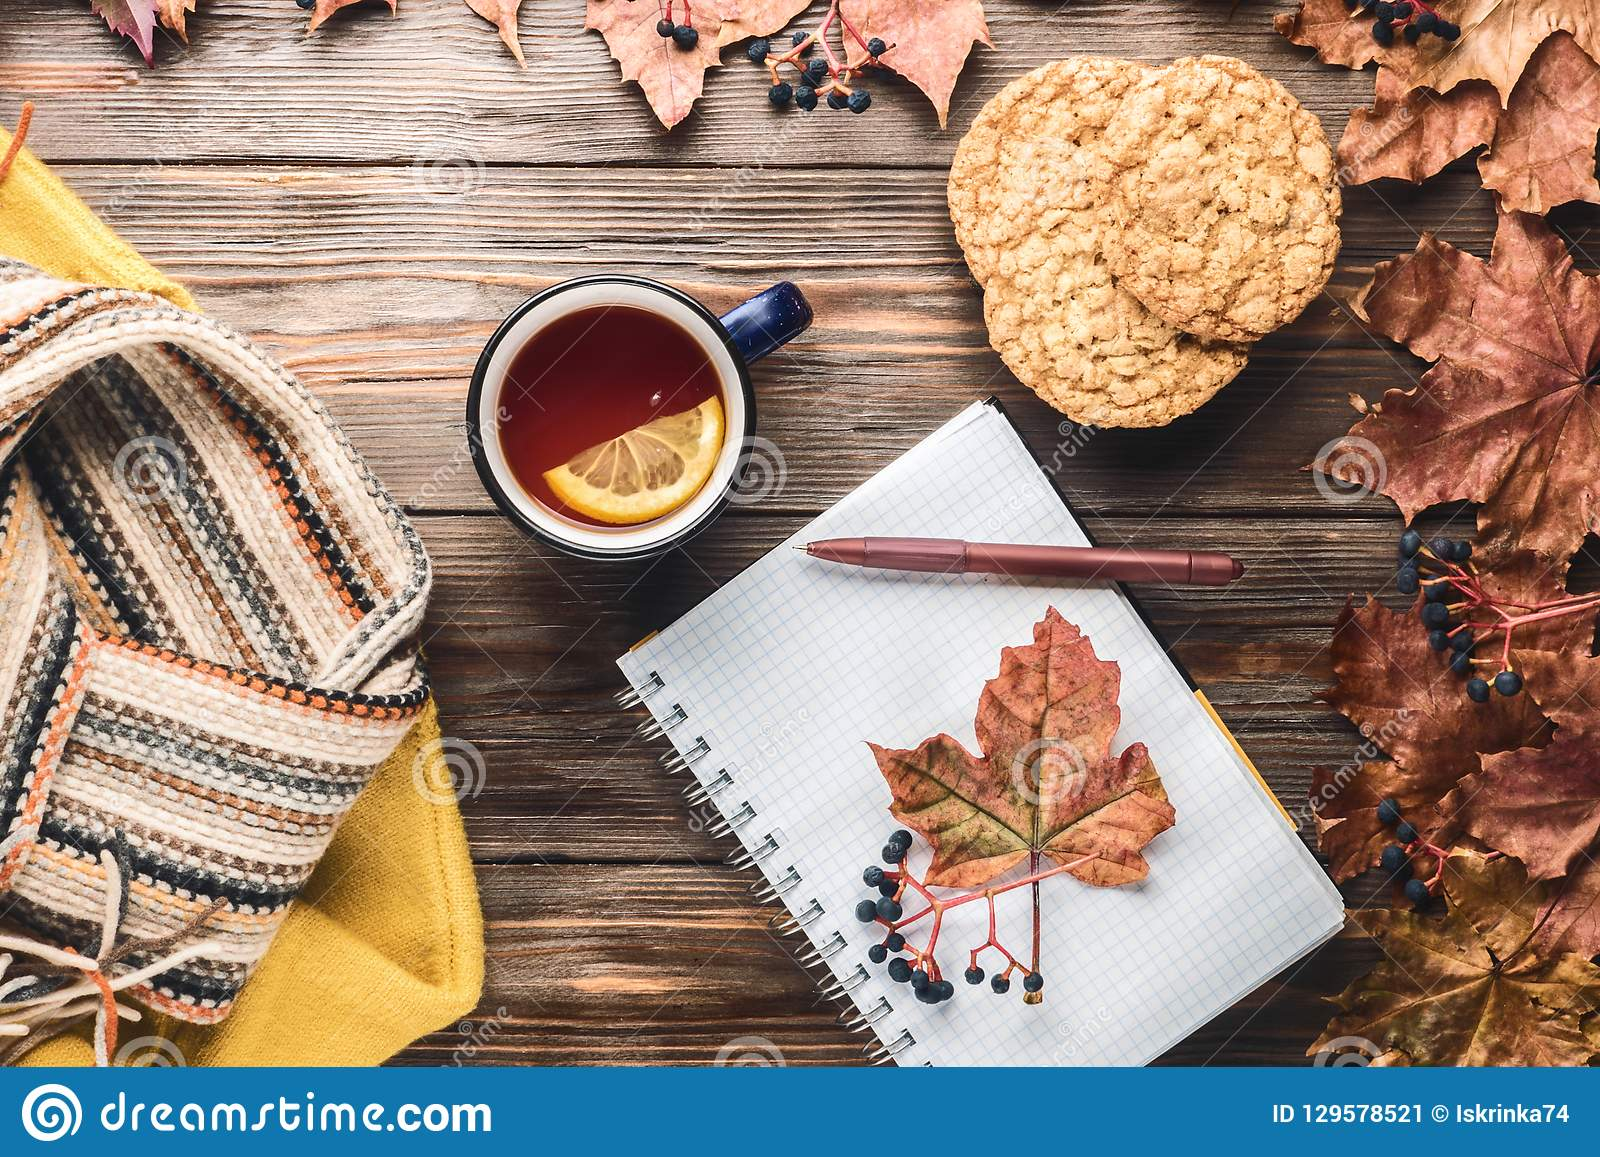 Autumn fashion seasonal concept sweater cardigan Scandinavian knitted scarf cup hot black tea